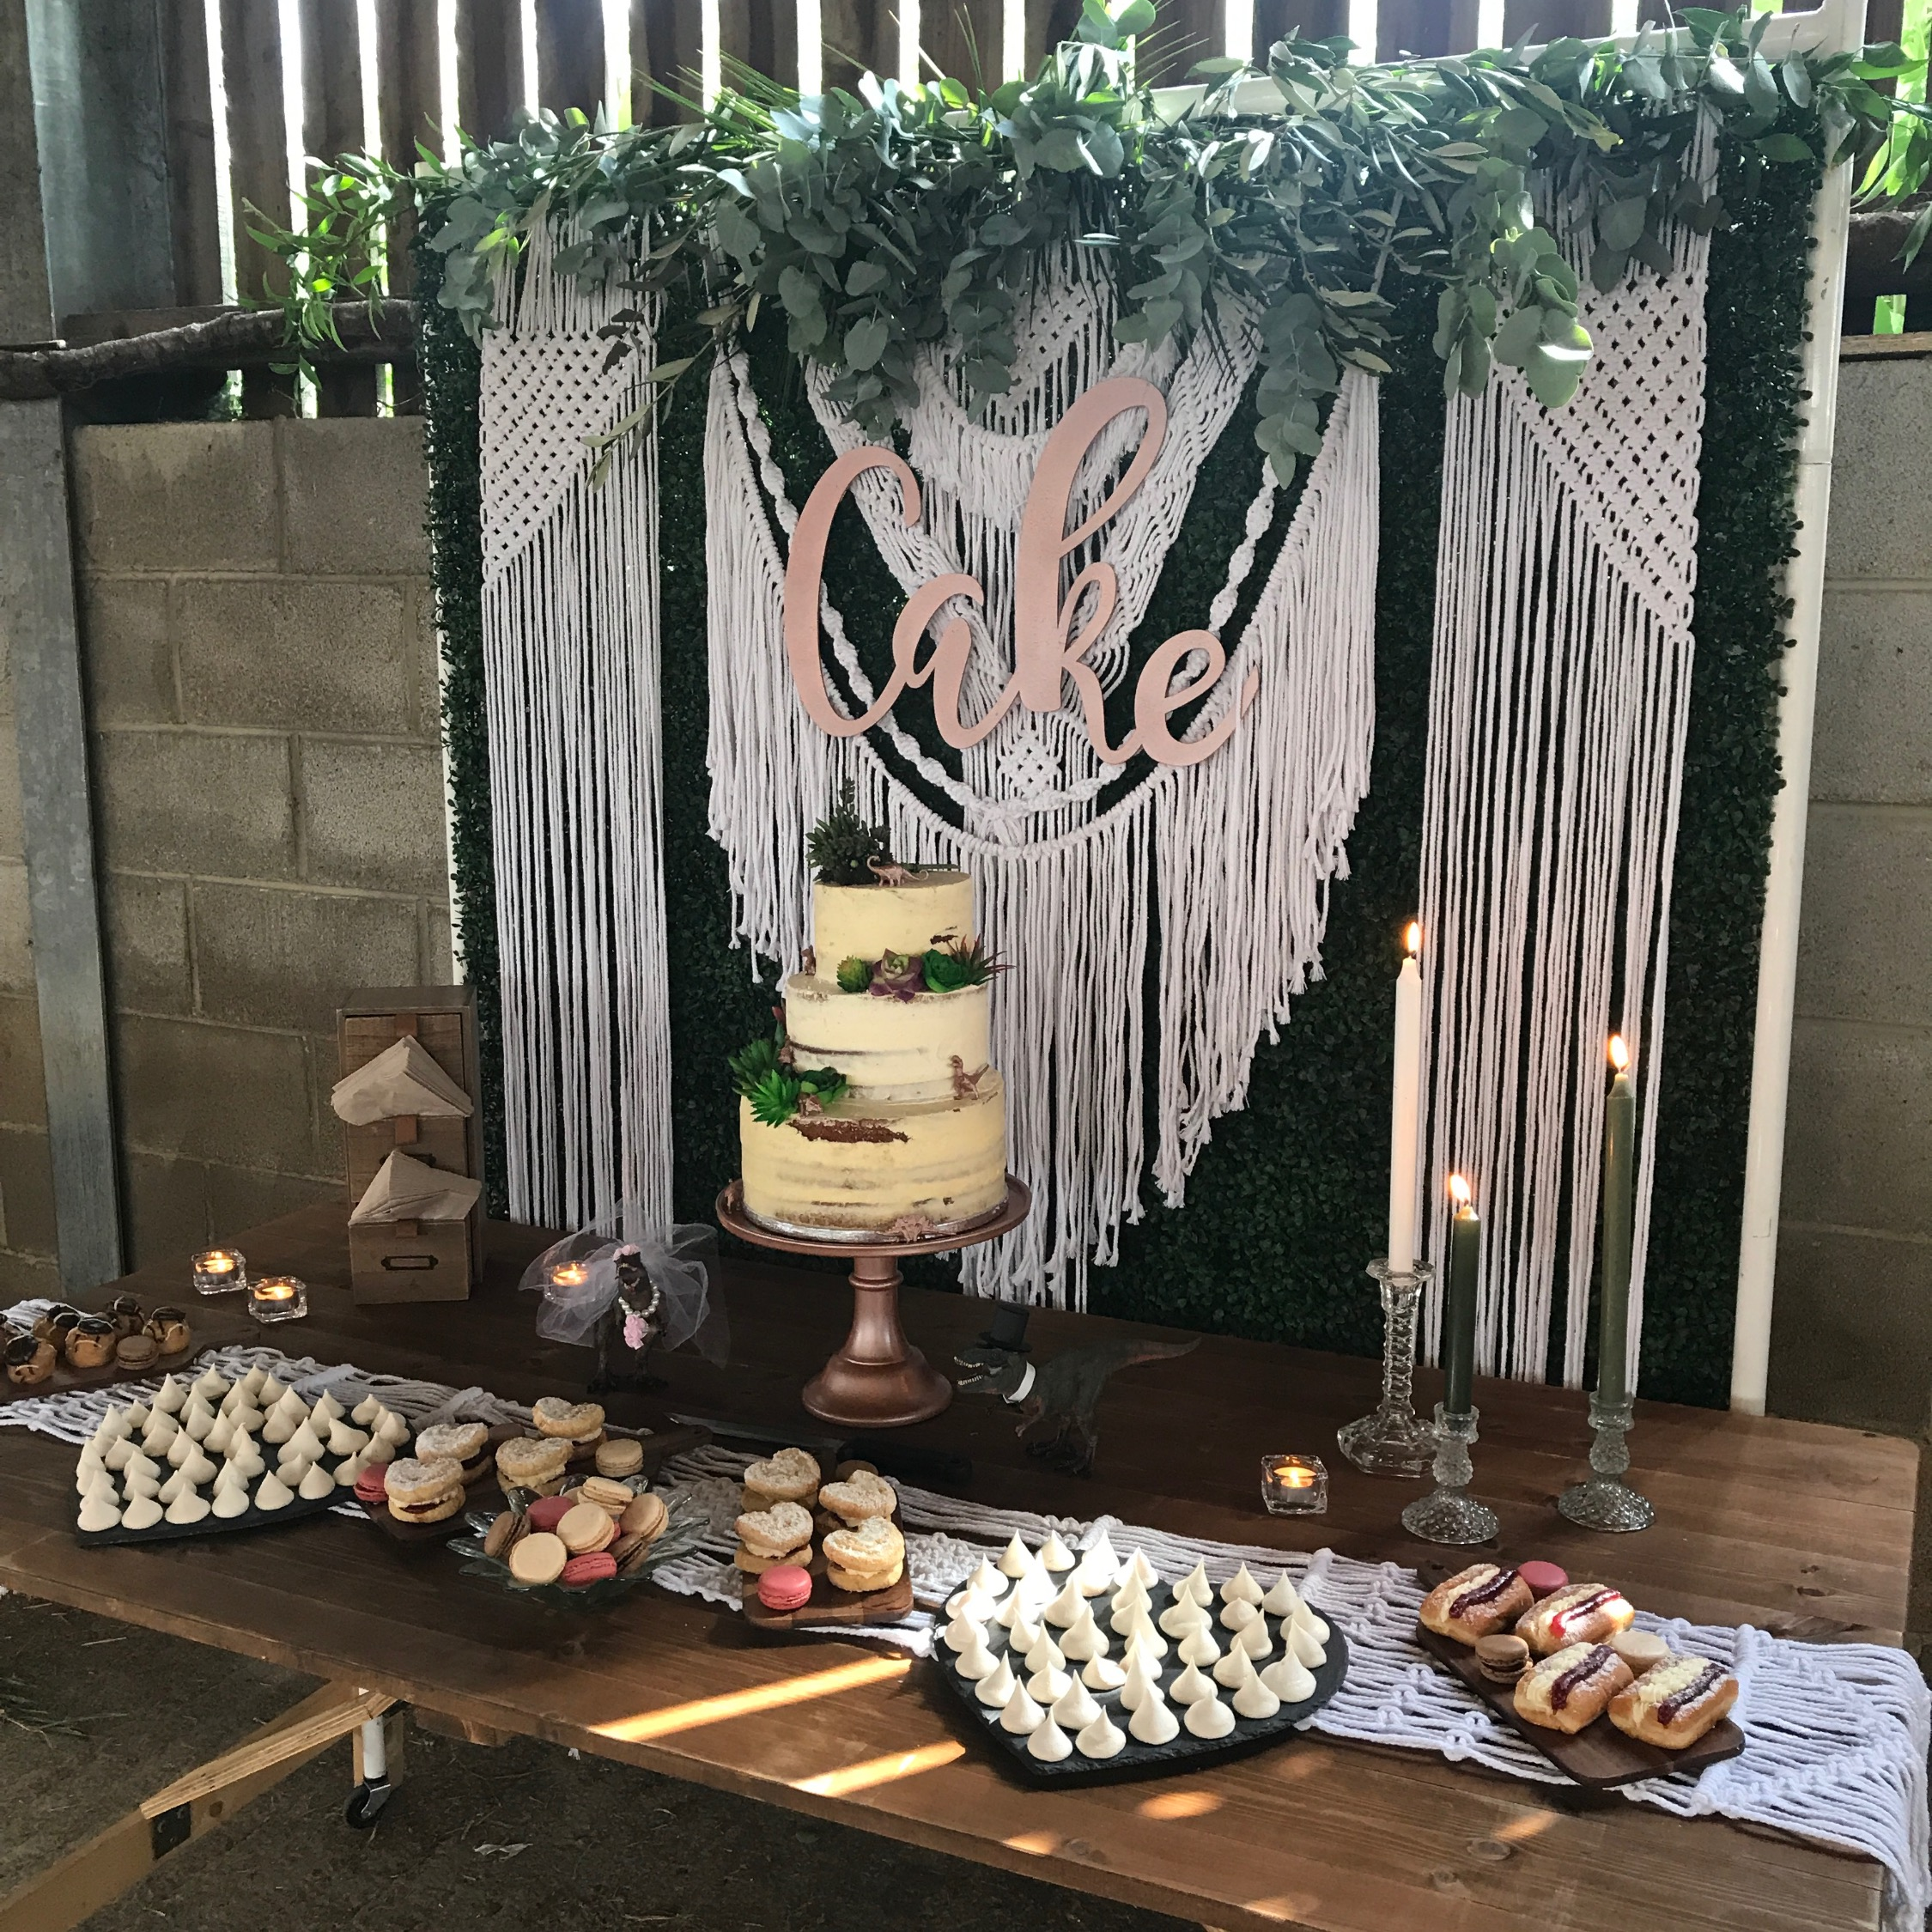 BOHO CAKE DISPLAY